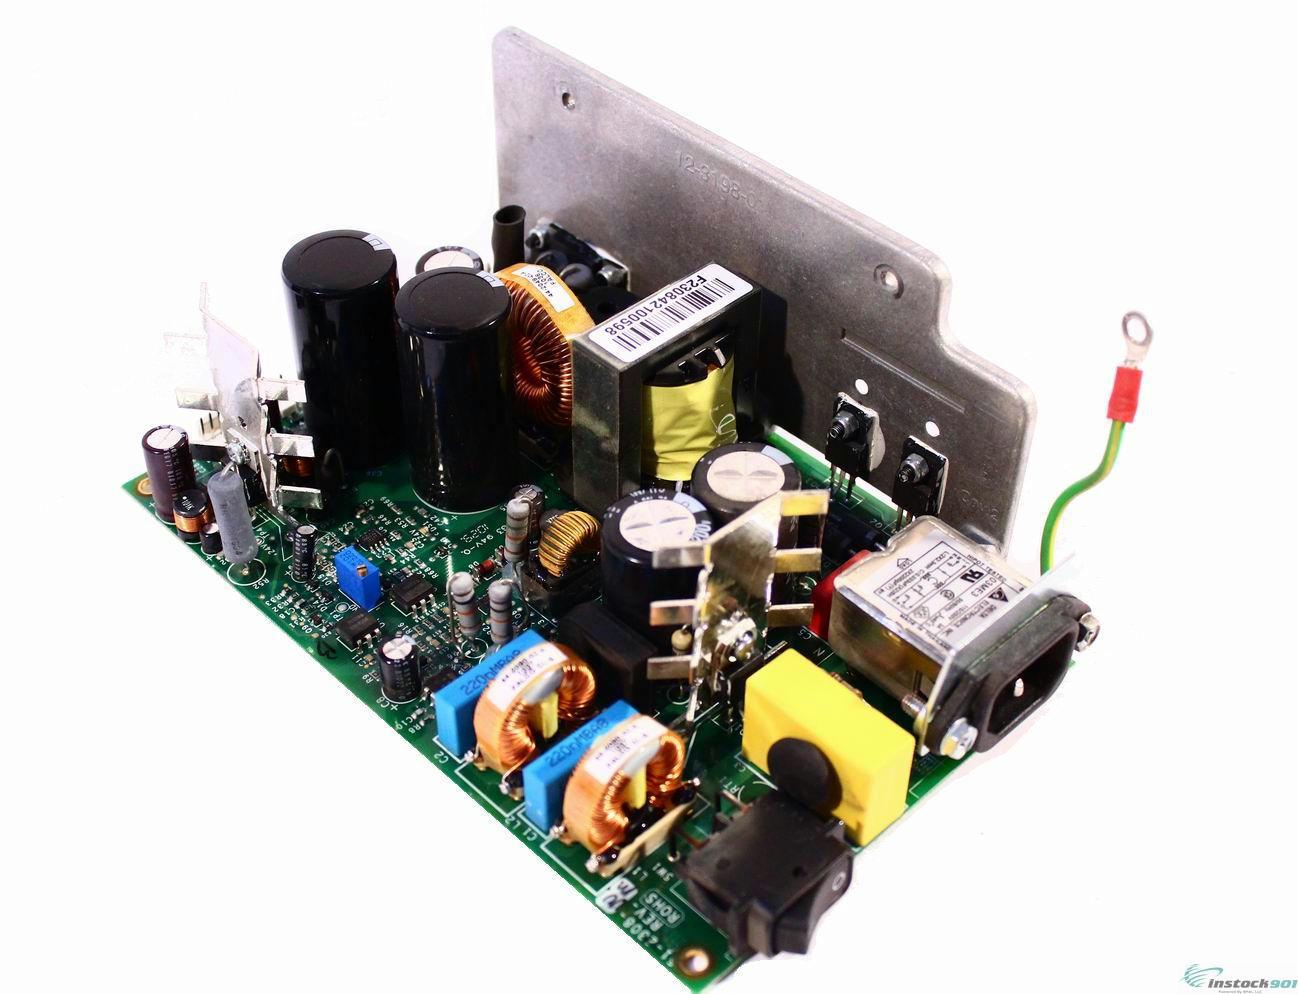 I-4308 DATAMAX DPR51-2308-00 Power Supply I-4208 I-4210 I-4212